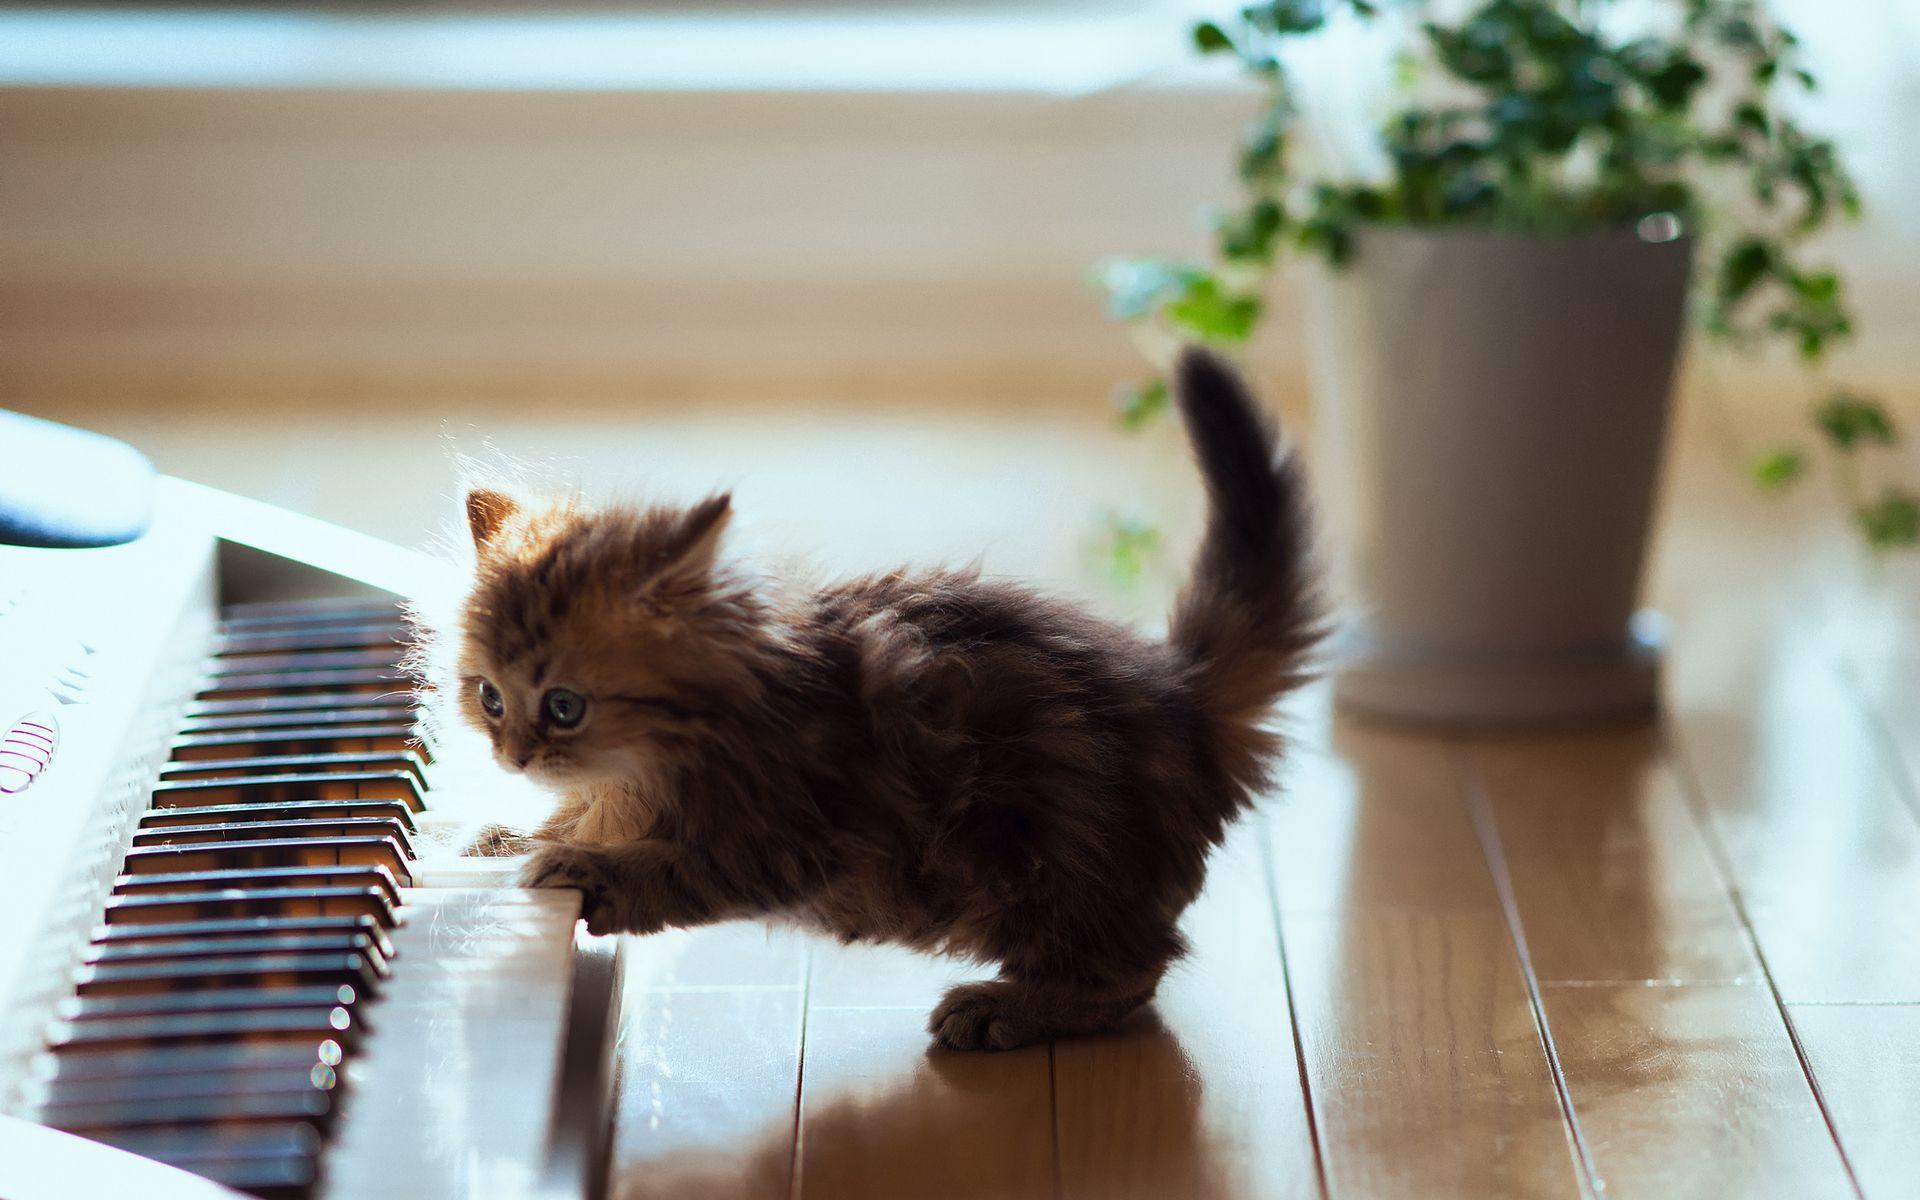 Pin by ryan mitchell on catblog Pinterest